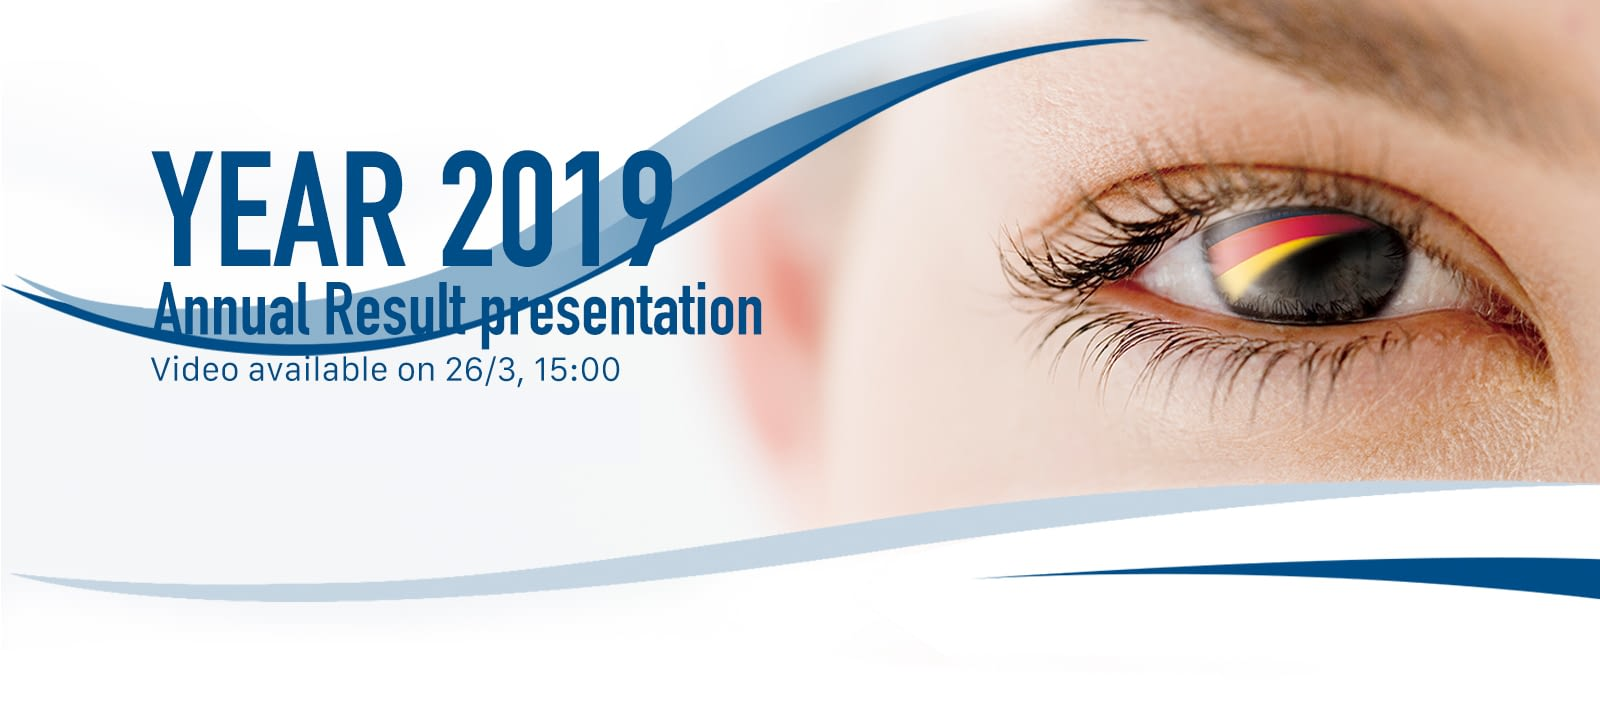 2019 Annual Result Presentation